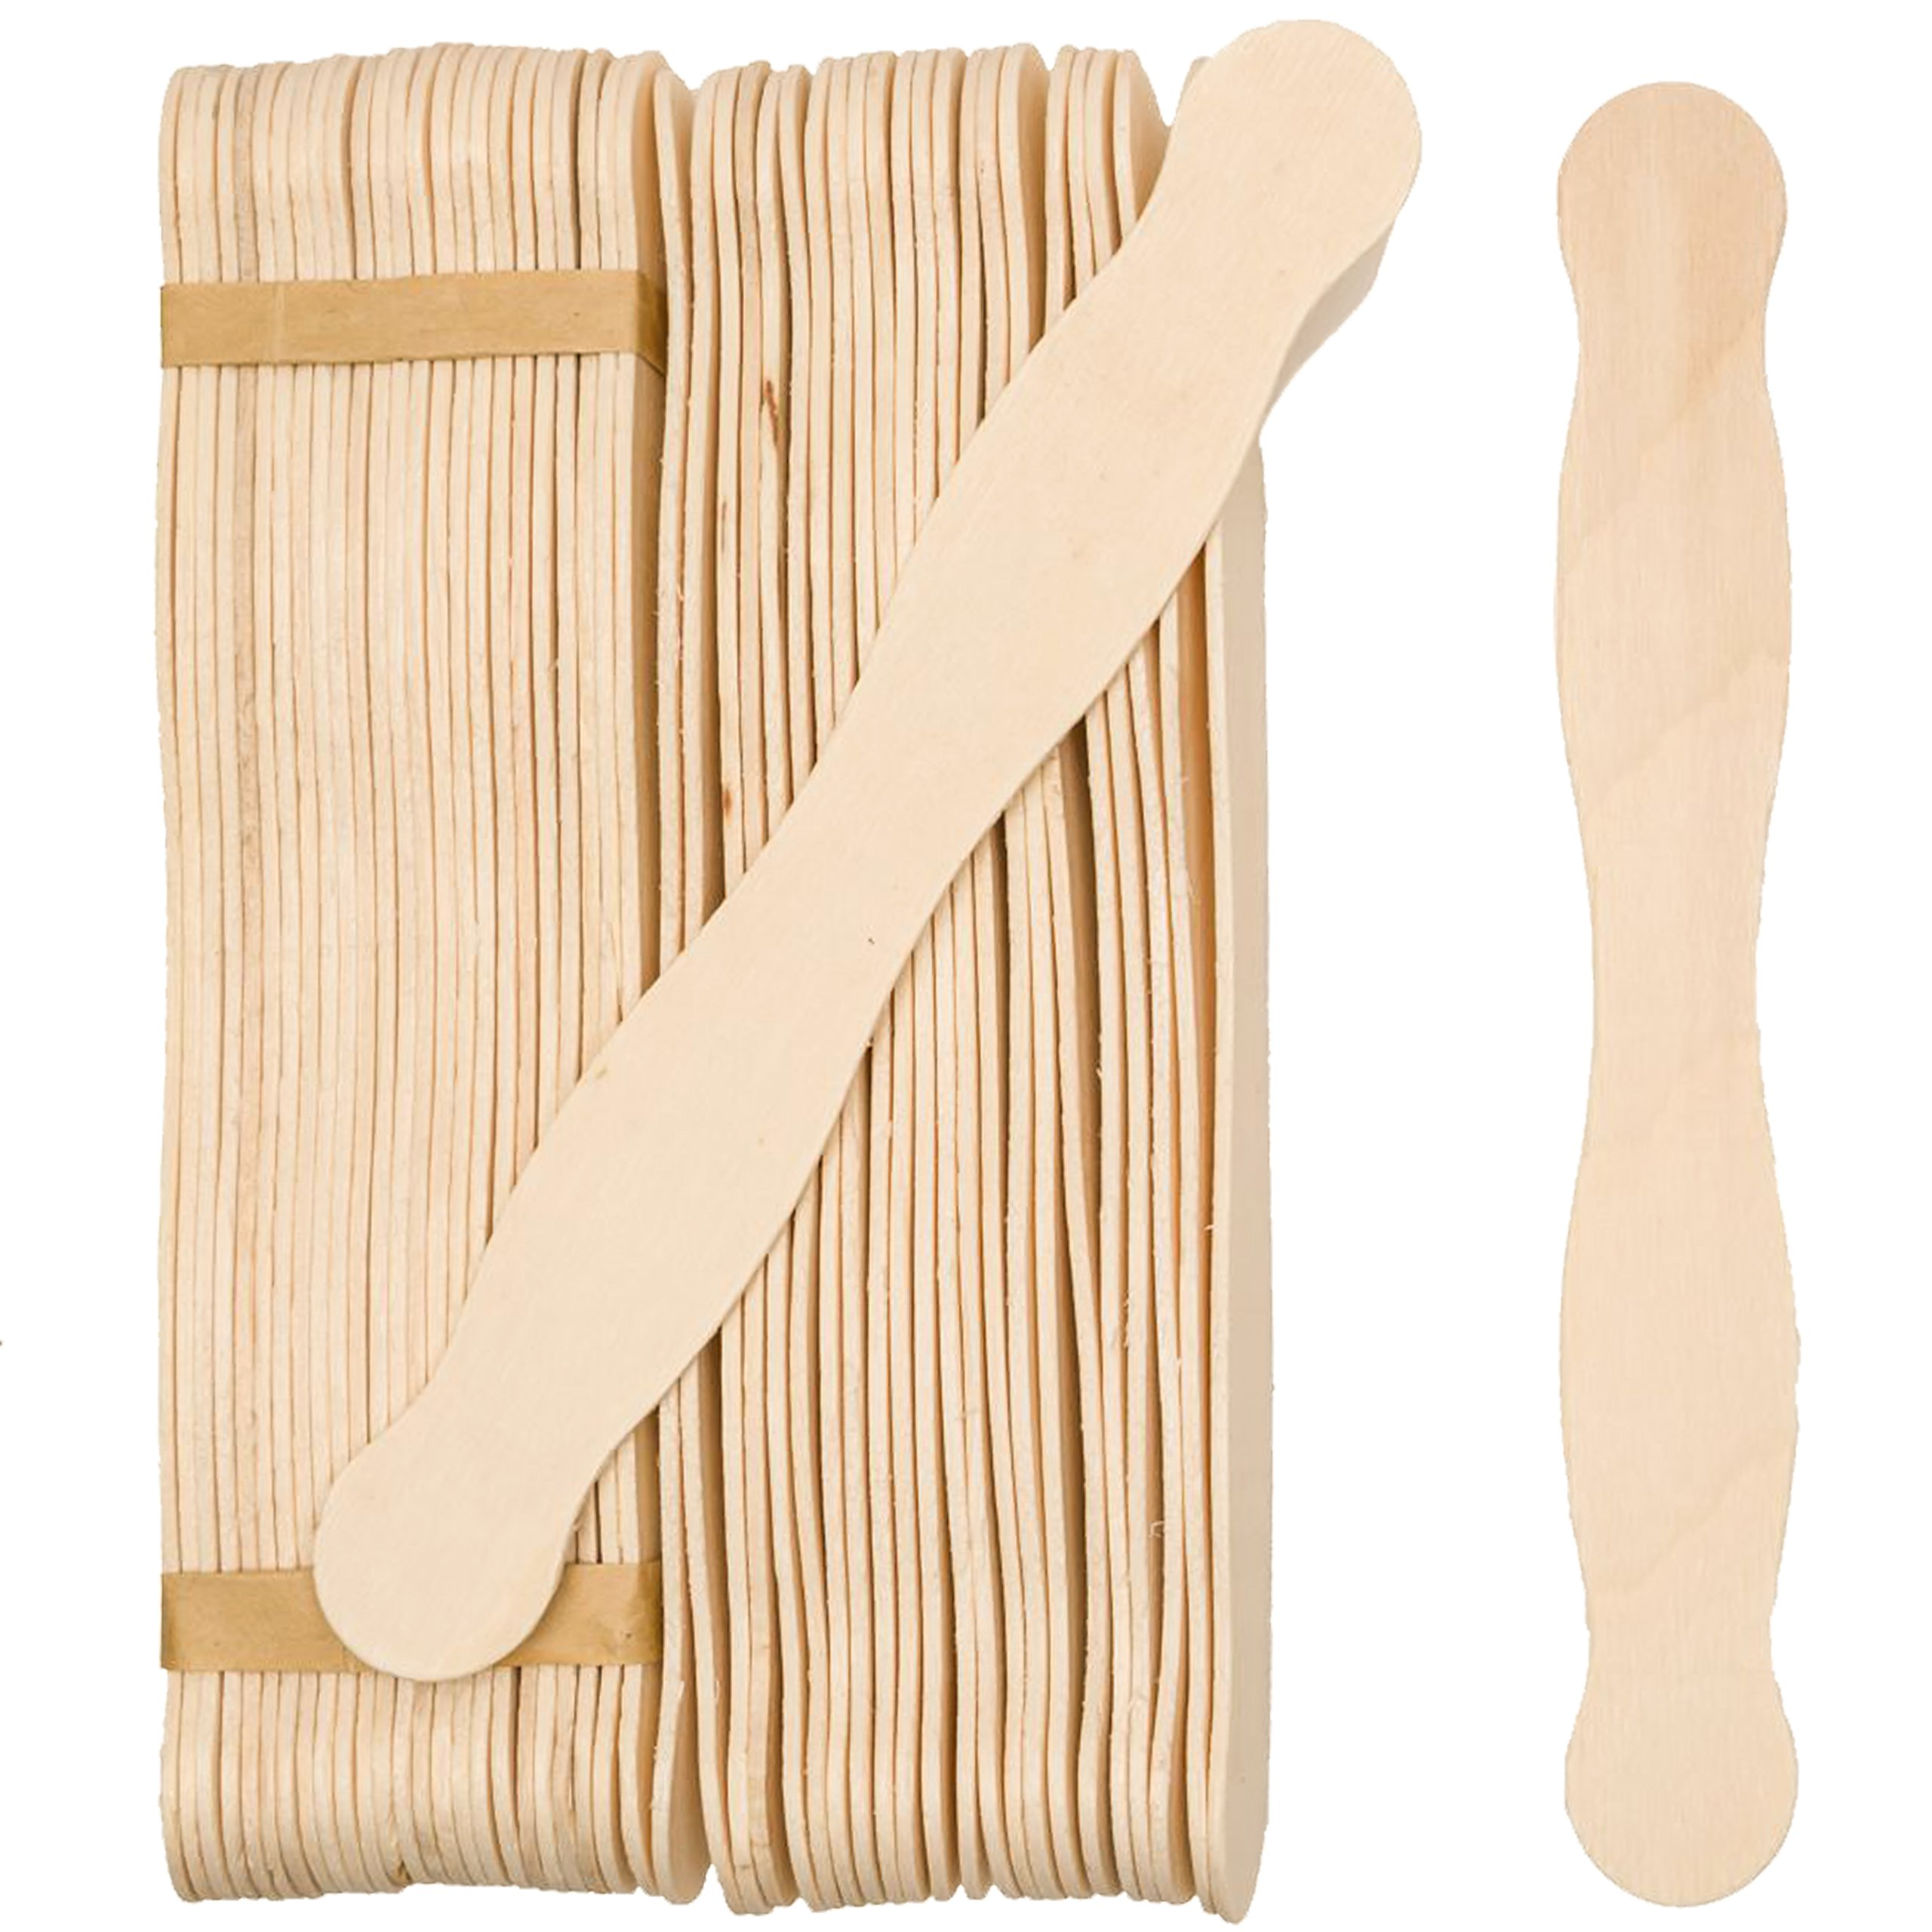 200 Natural Wavy Jumbo Wood Fan Handles Wedding Fan Craft Sticks - 8'' Wavy Craft sticks - By Woodpeckers